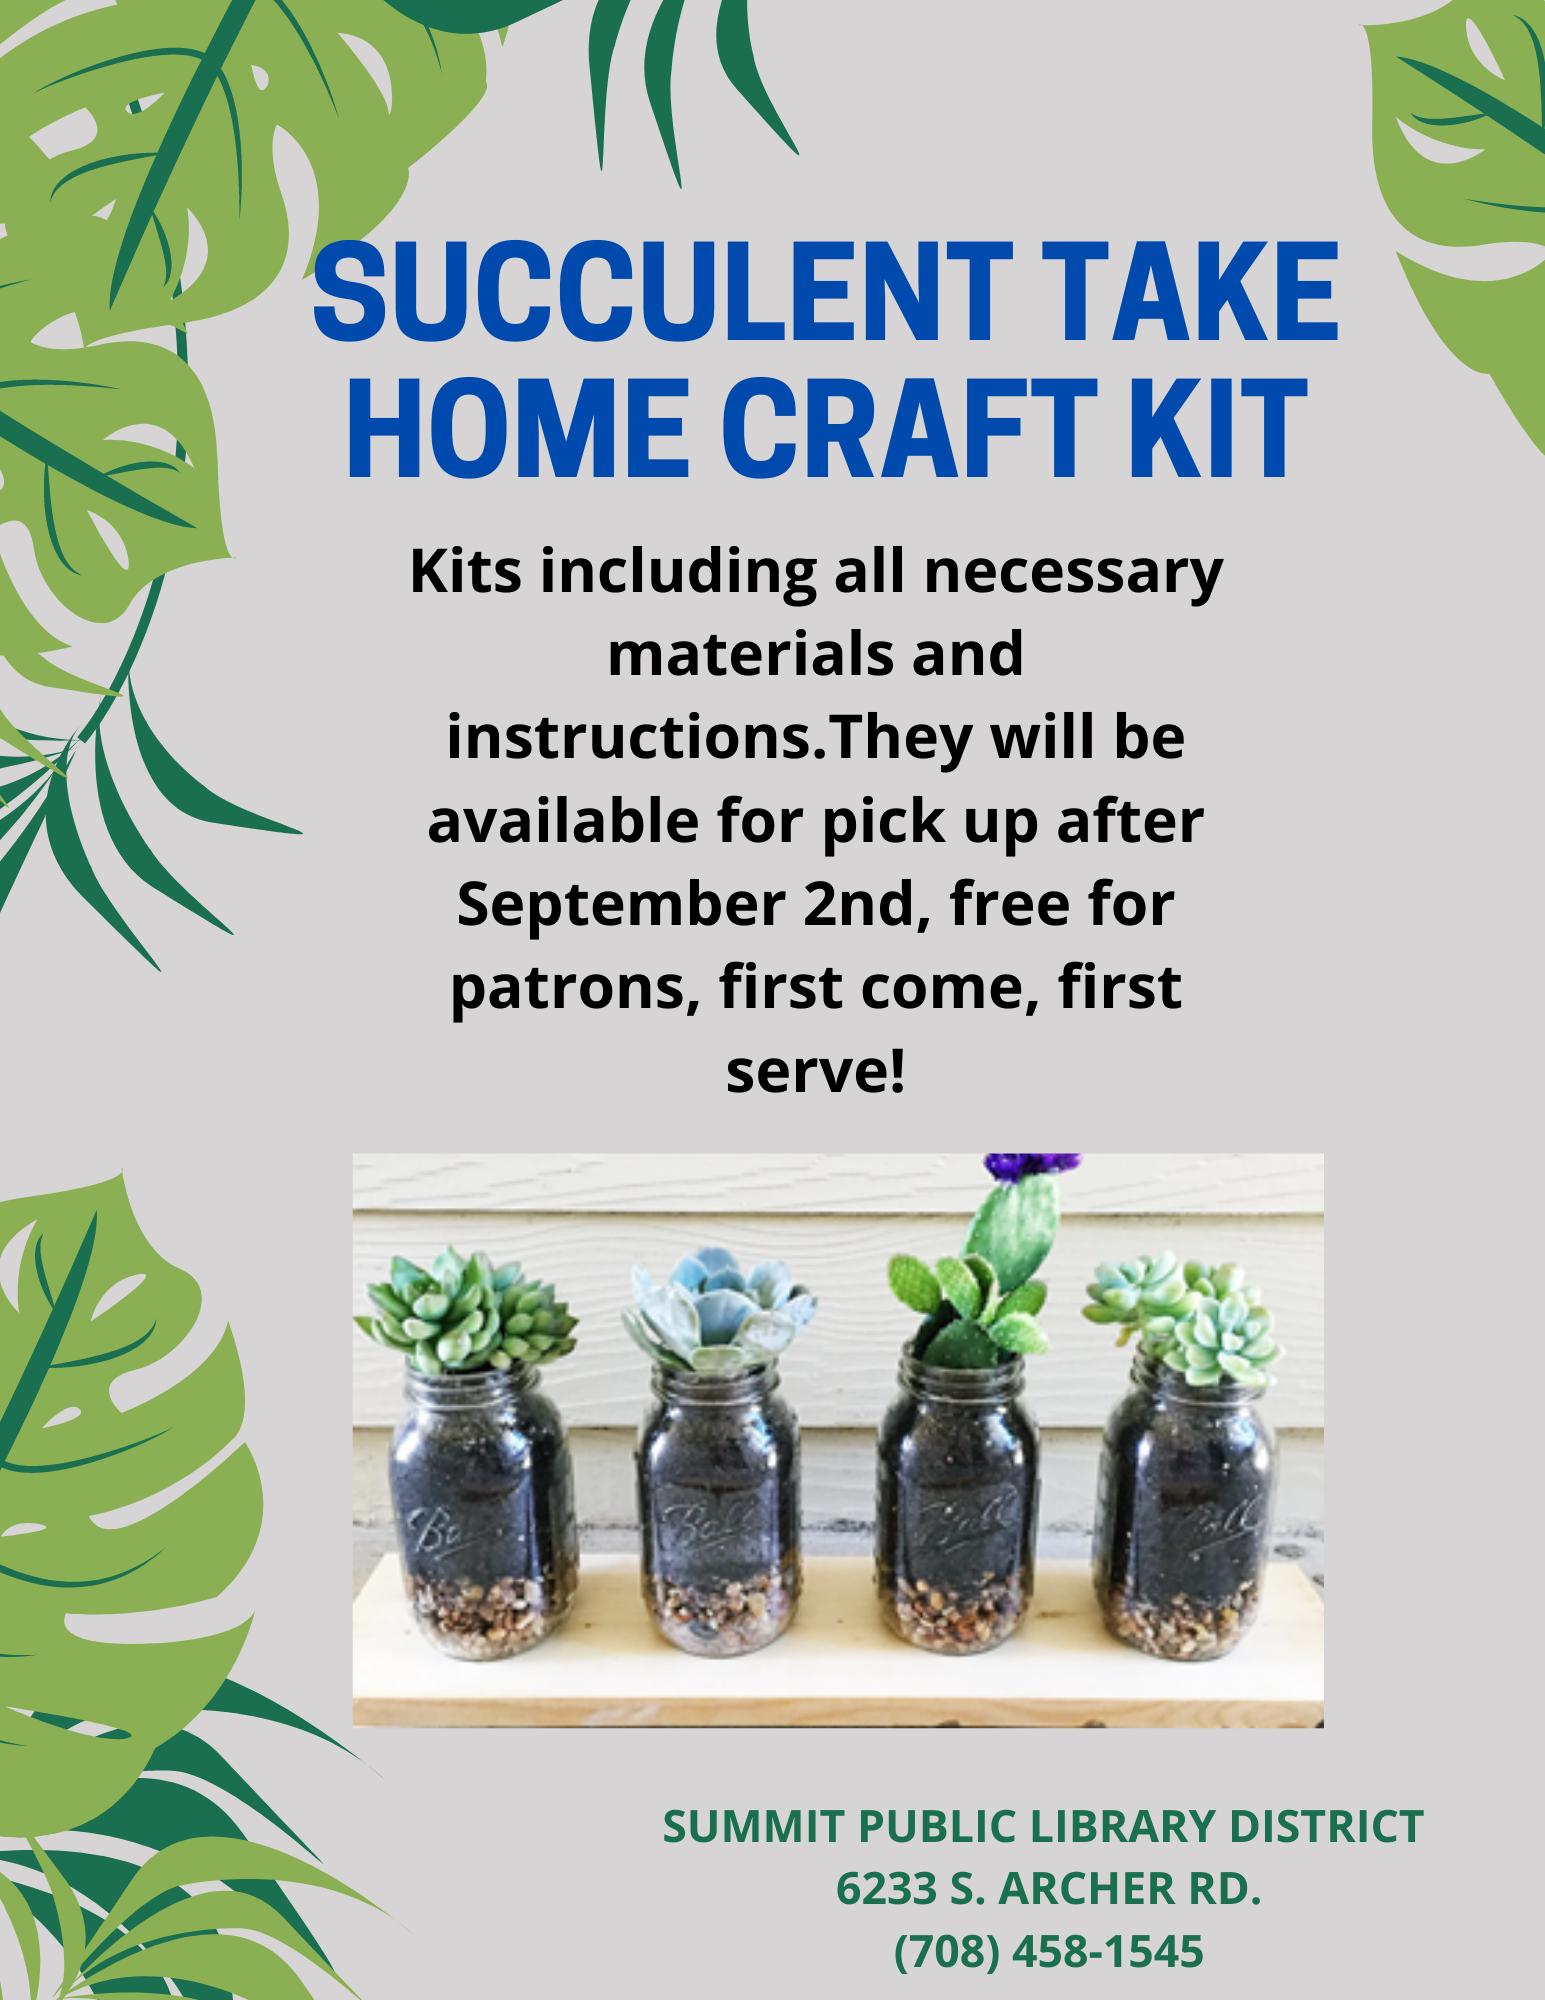 Succulent Take Home Craft